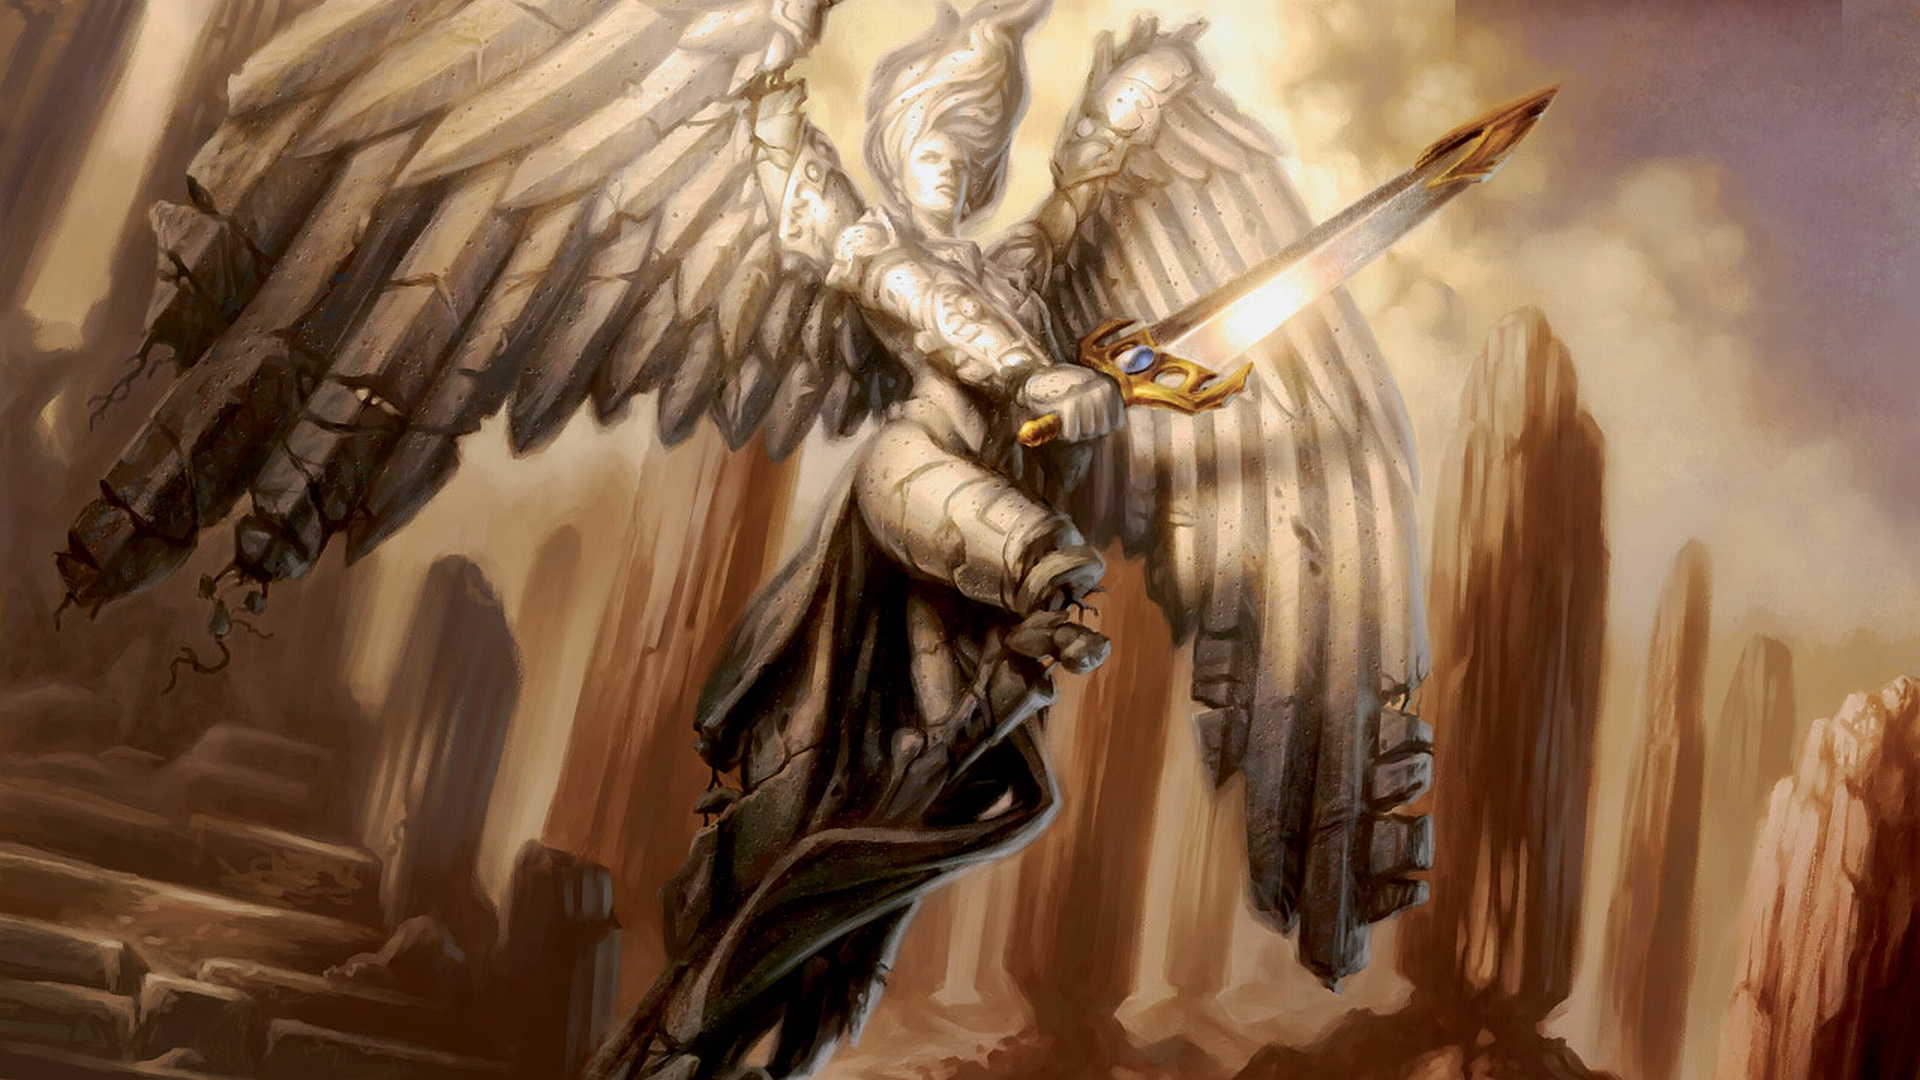 Game - Magic: The Gathering  Dark Gothic Angel Wings Sword Wallpaper